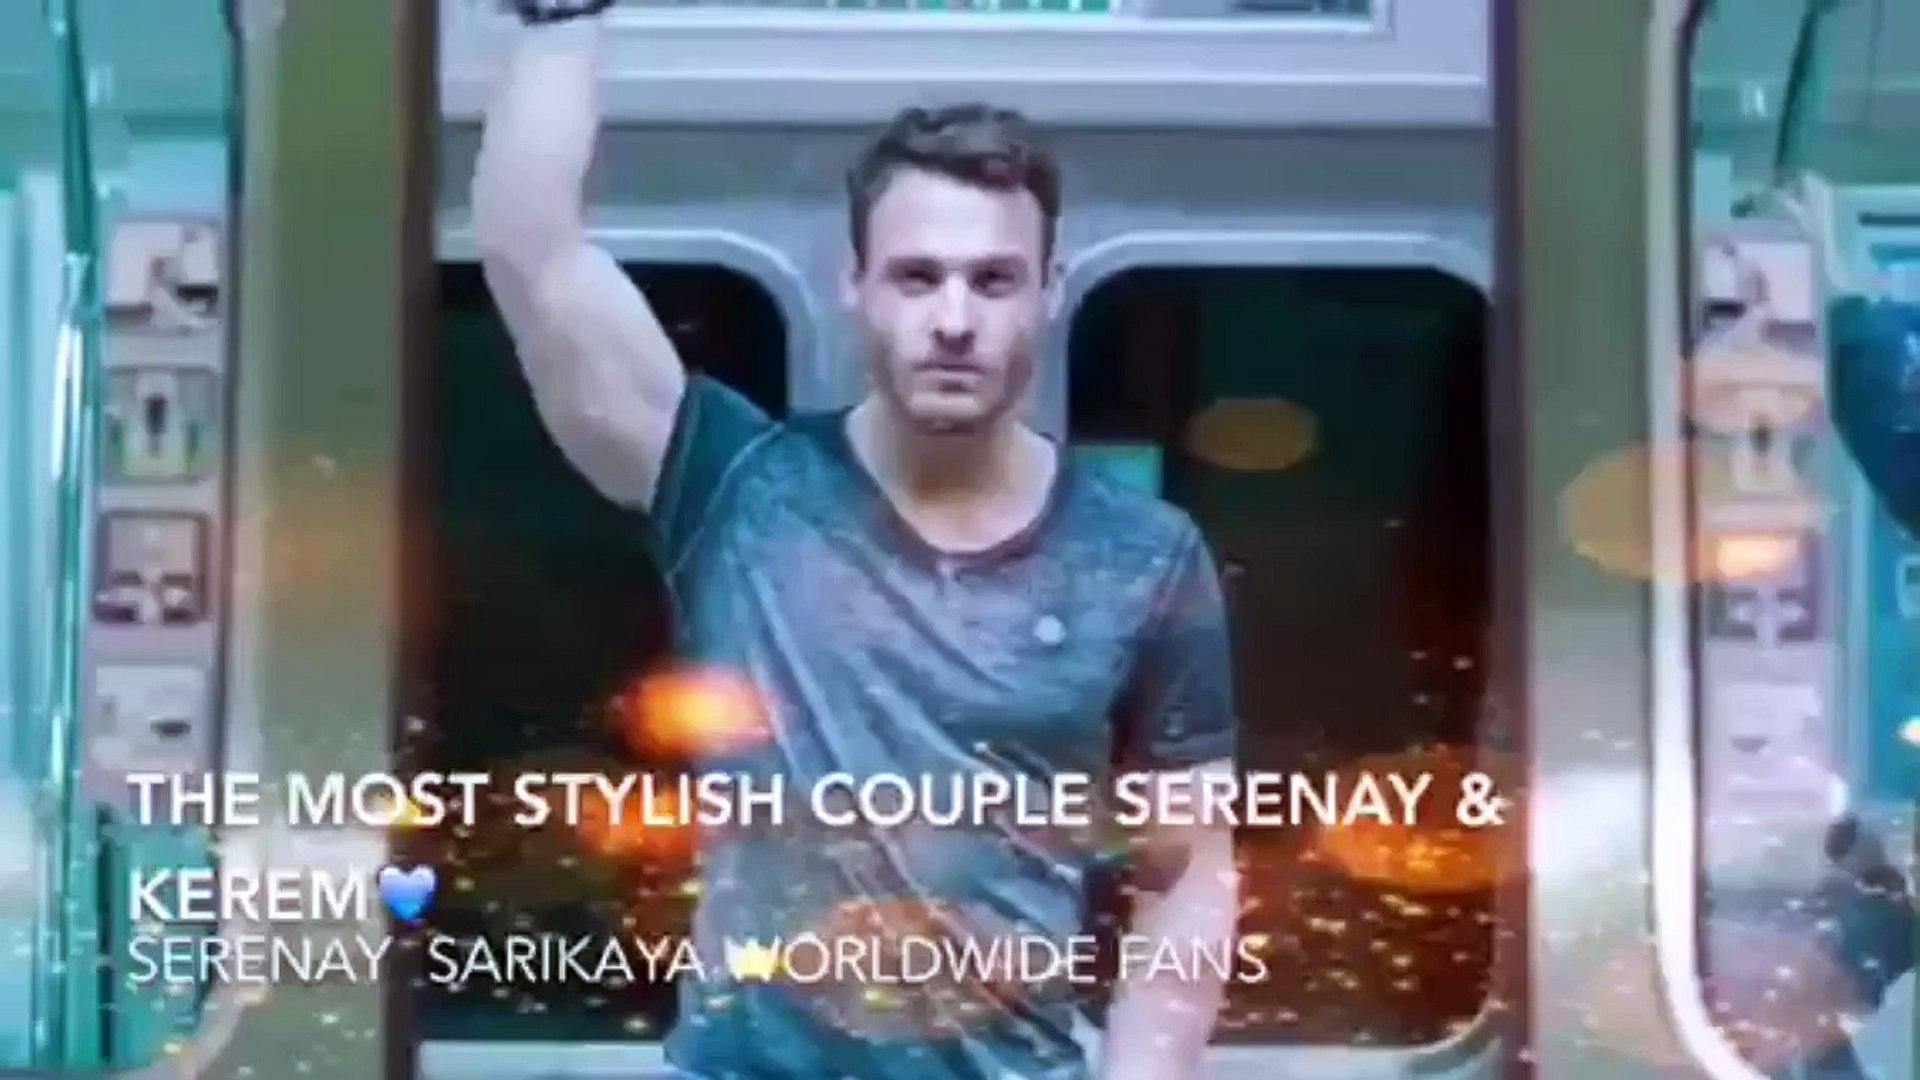 The most stylish Couple Serenay & Kerem in Mavi